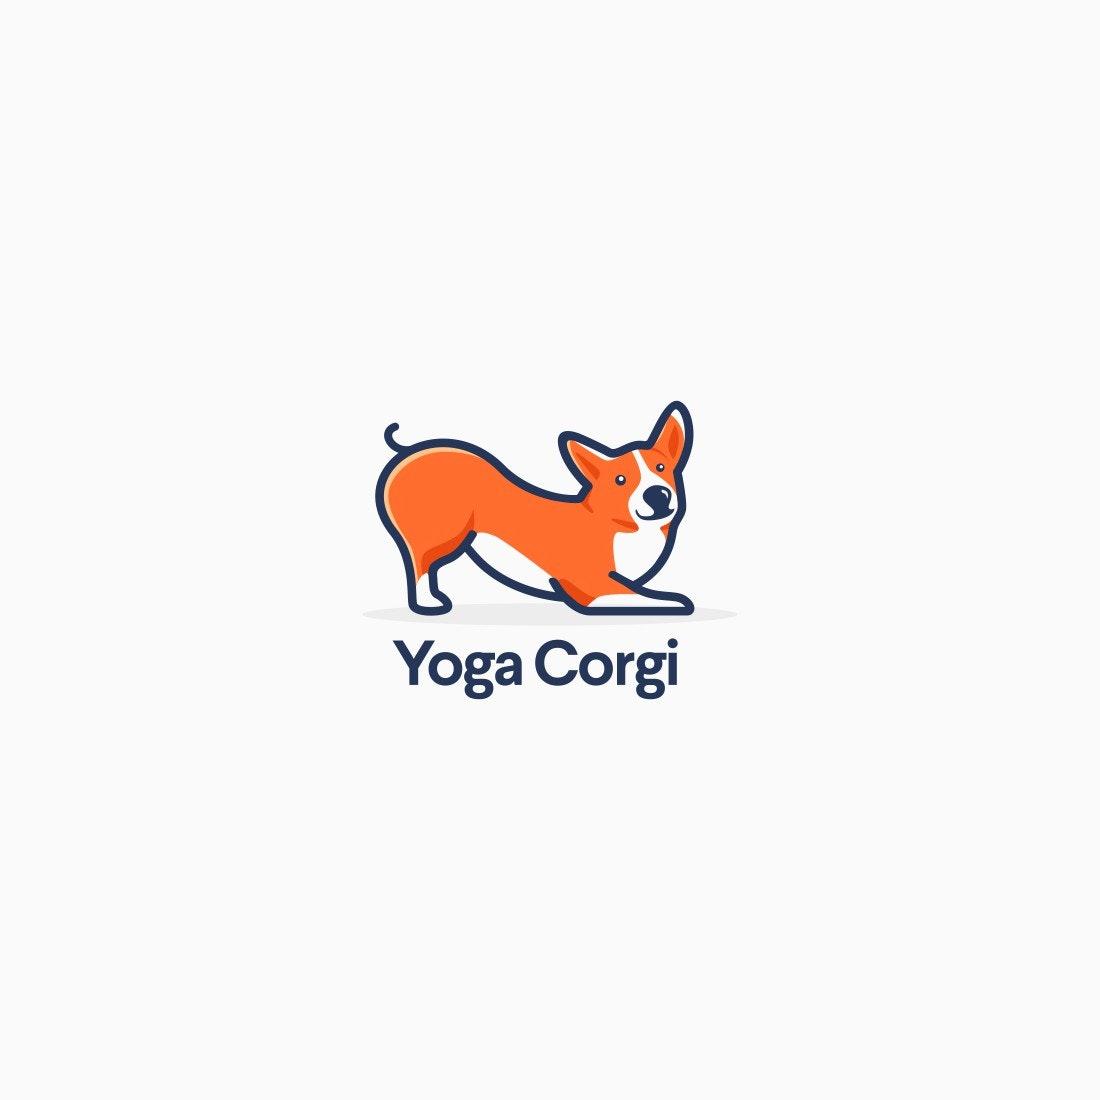 Yoga Corgi logo